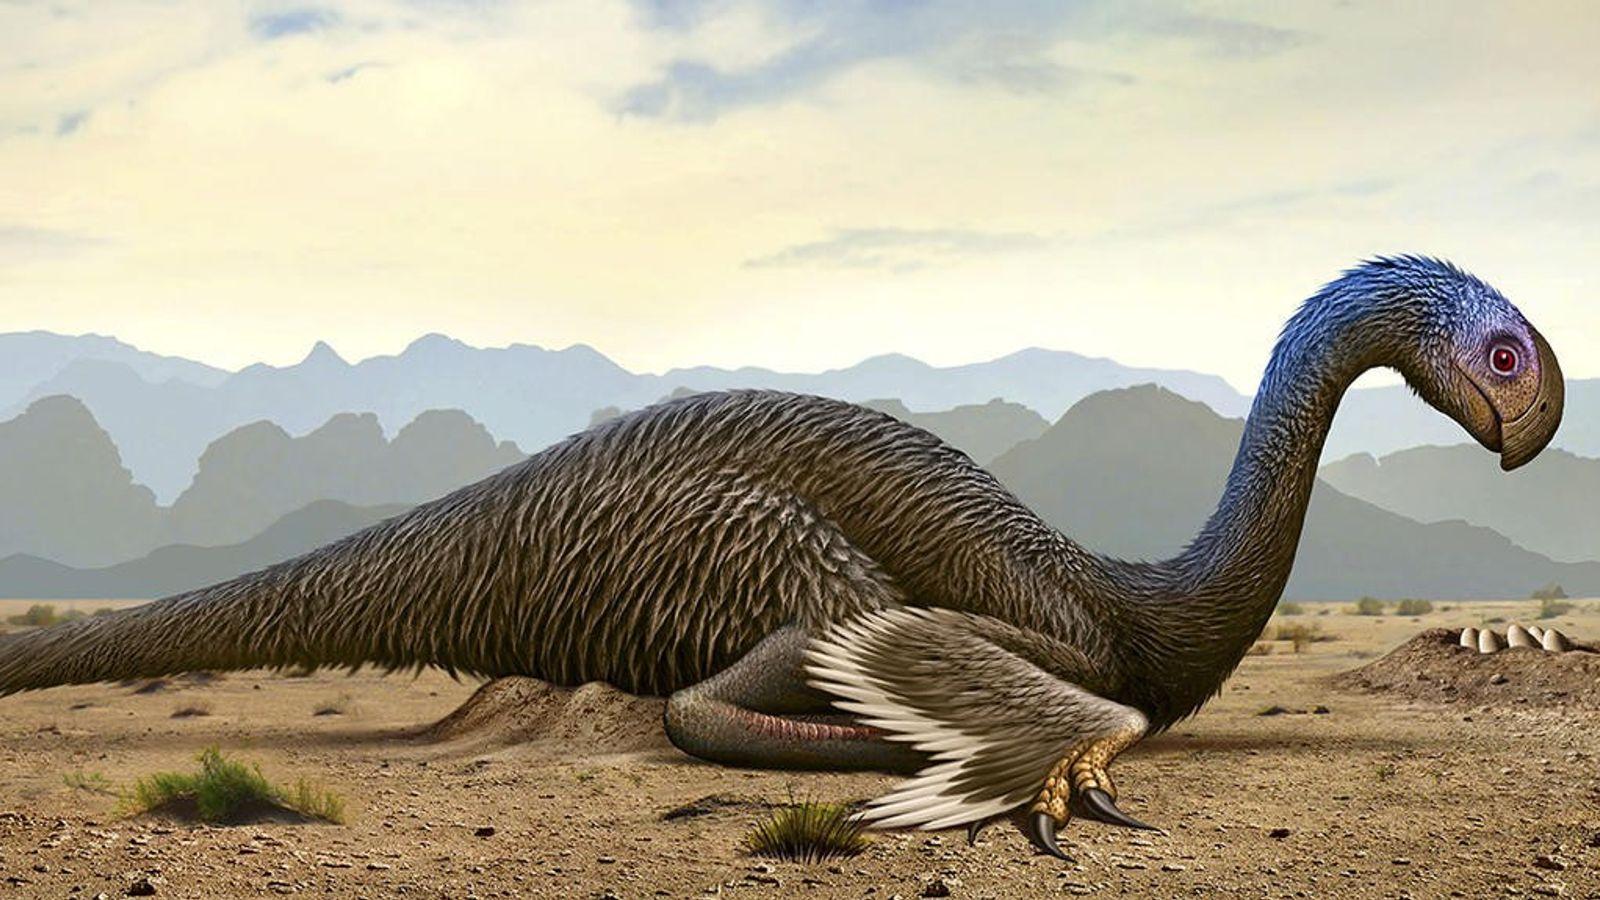 Vue d'artiste d'un gigantoraptor, genre de dinosaure oviraptorosaure disparu au Crétacé.